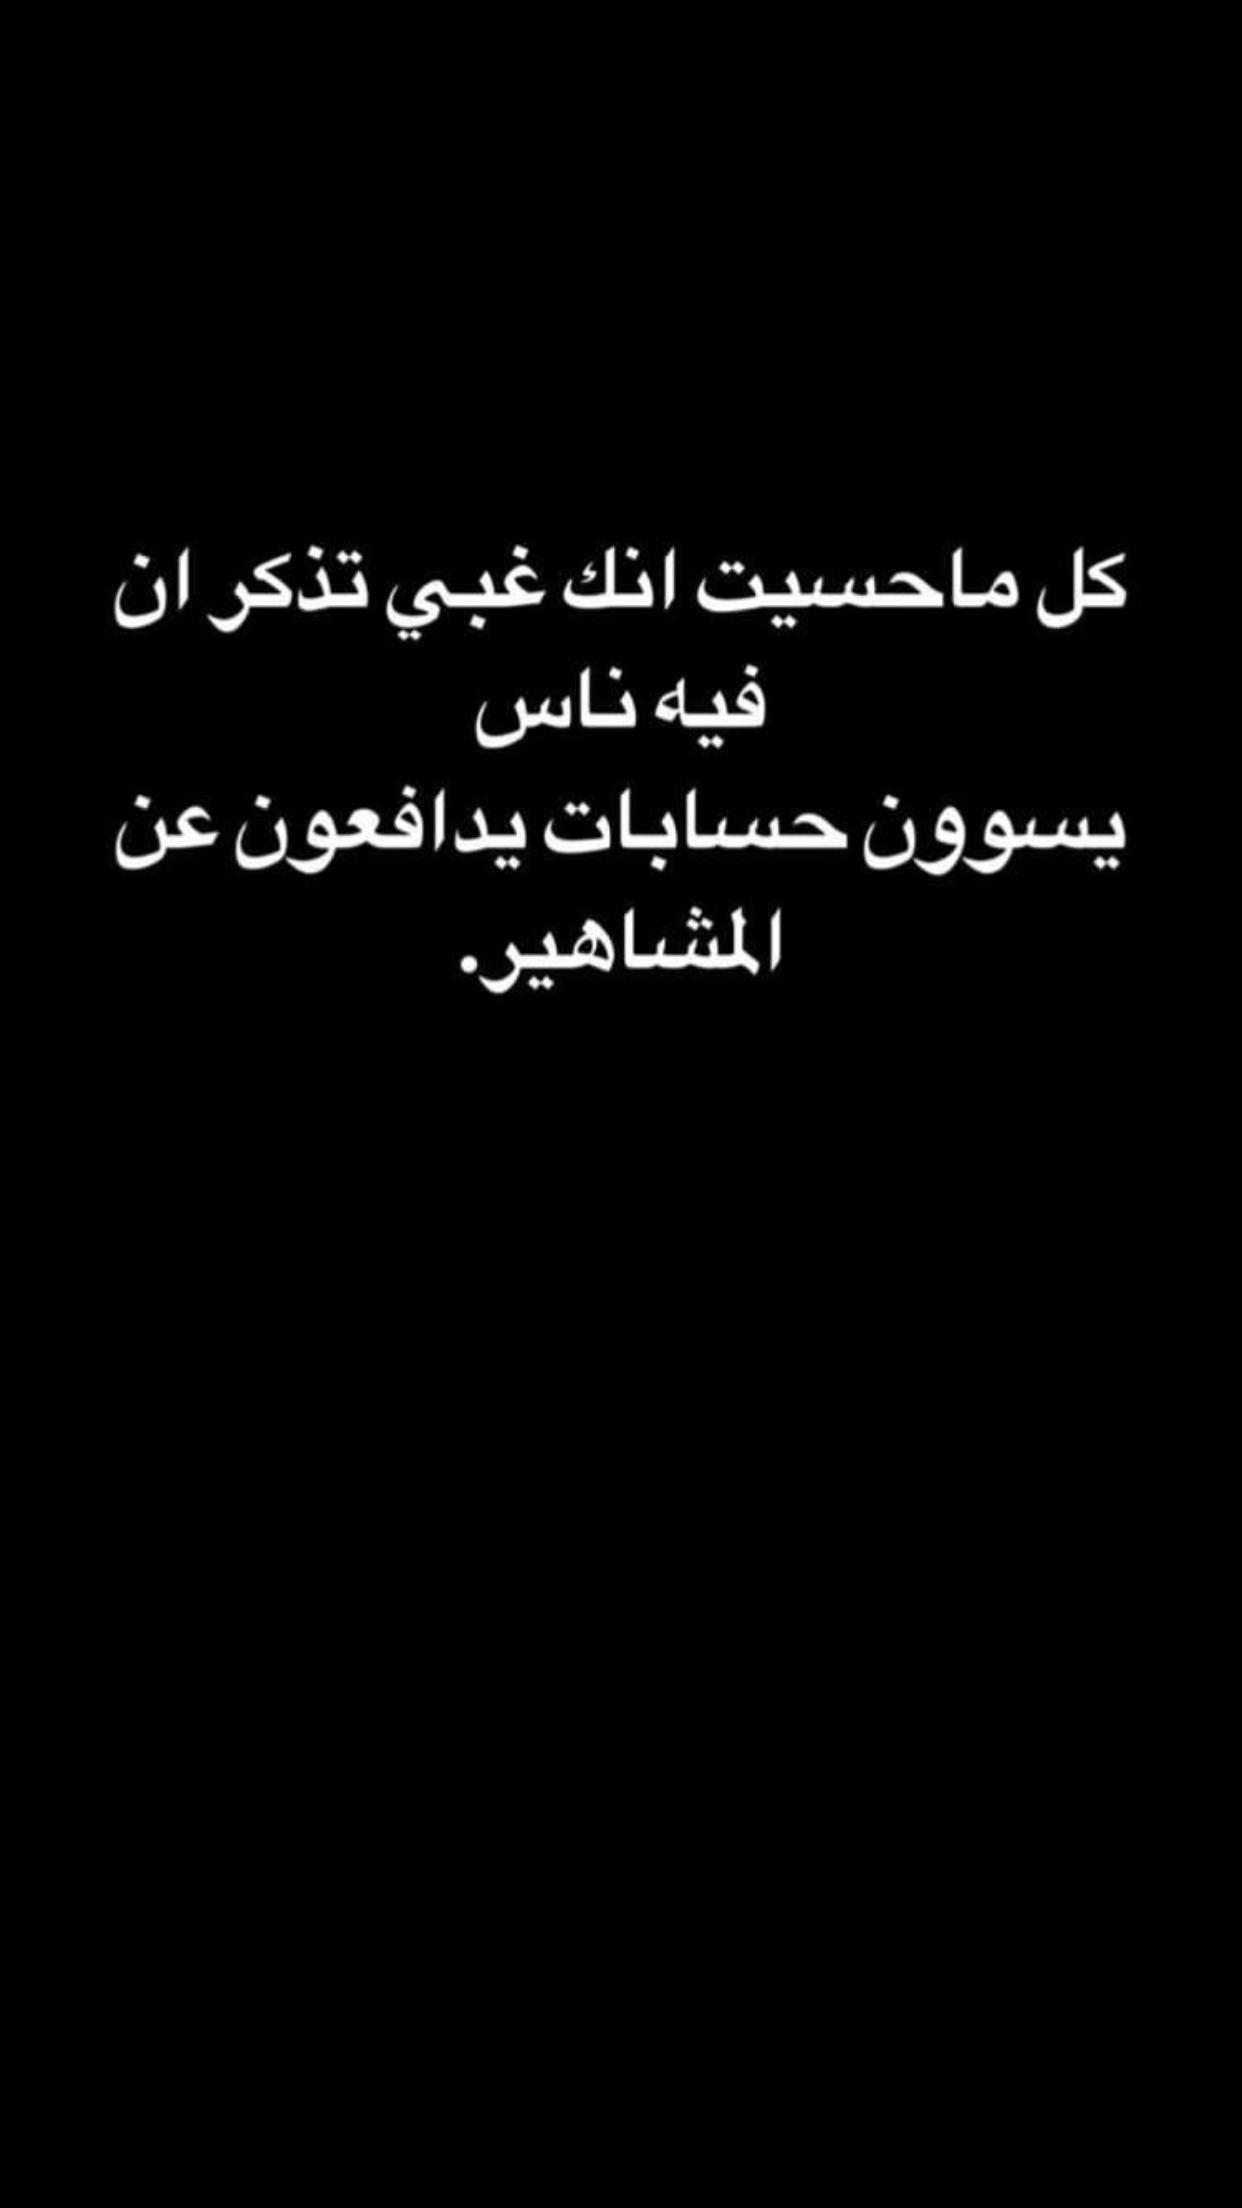 Desertrose العافية في اعتزال الناس والصمت Arabic Calligraphy Art Calligraphy